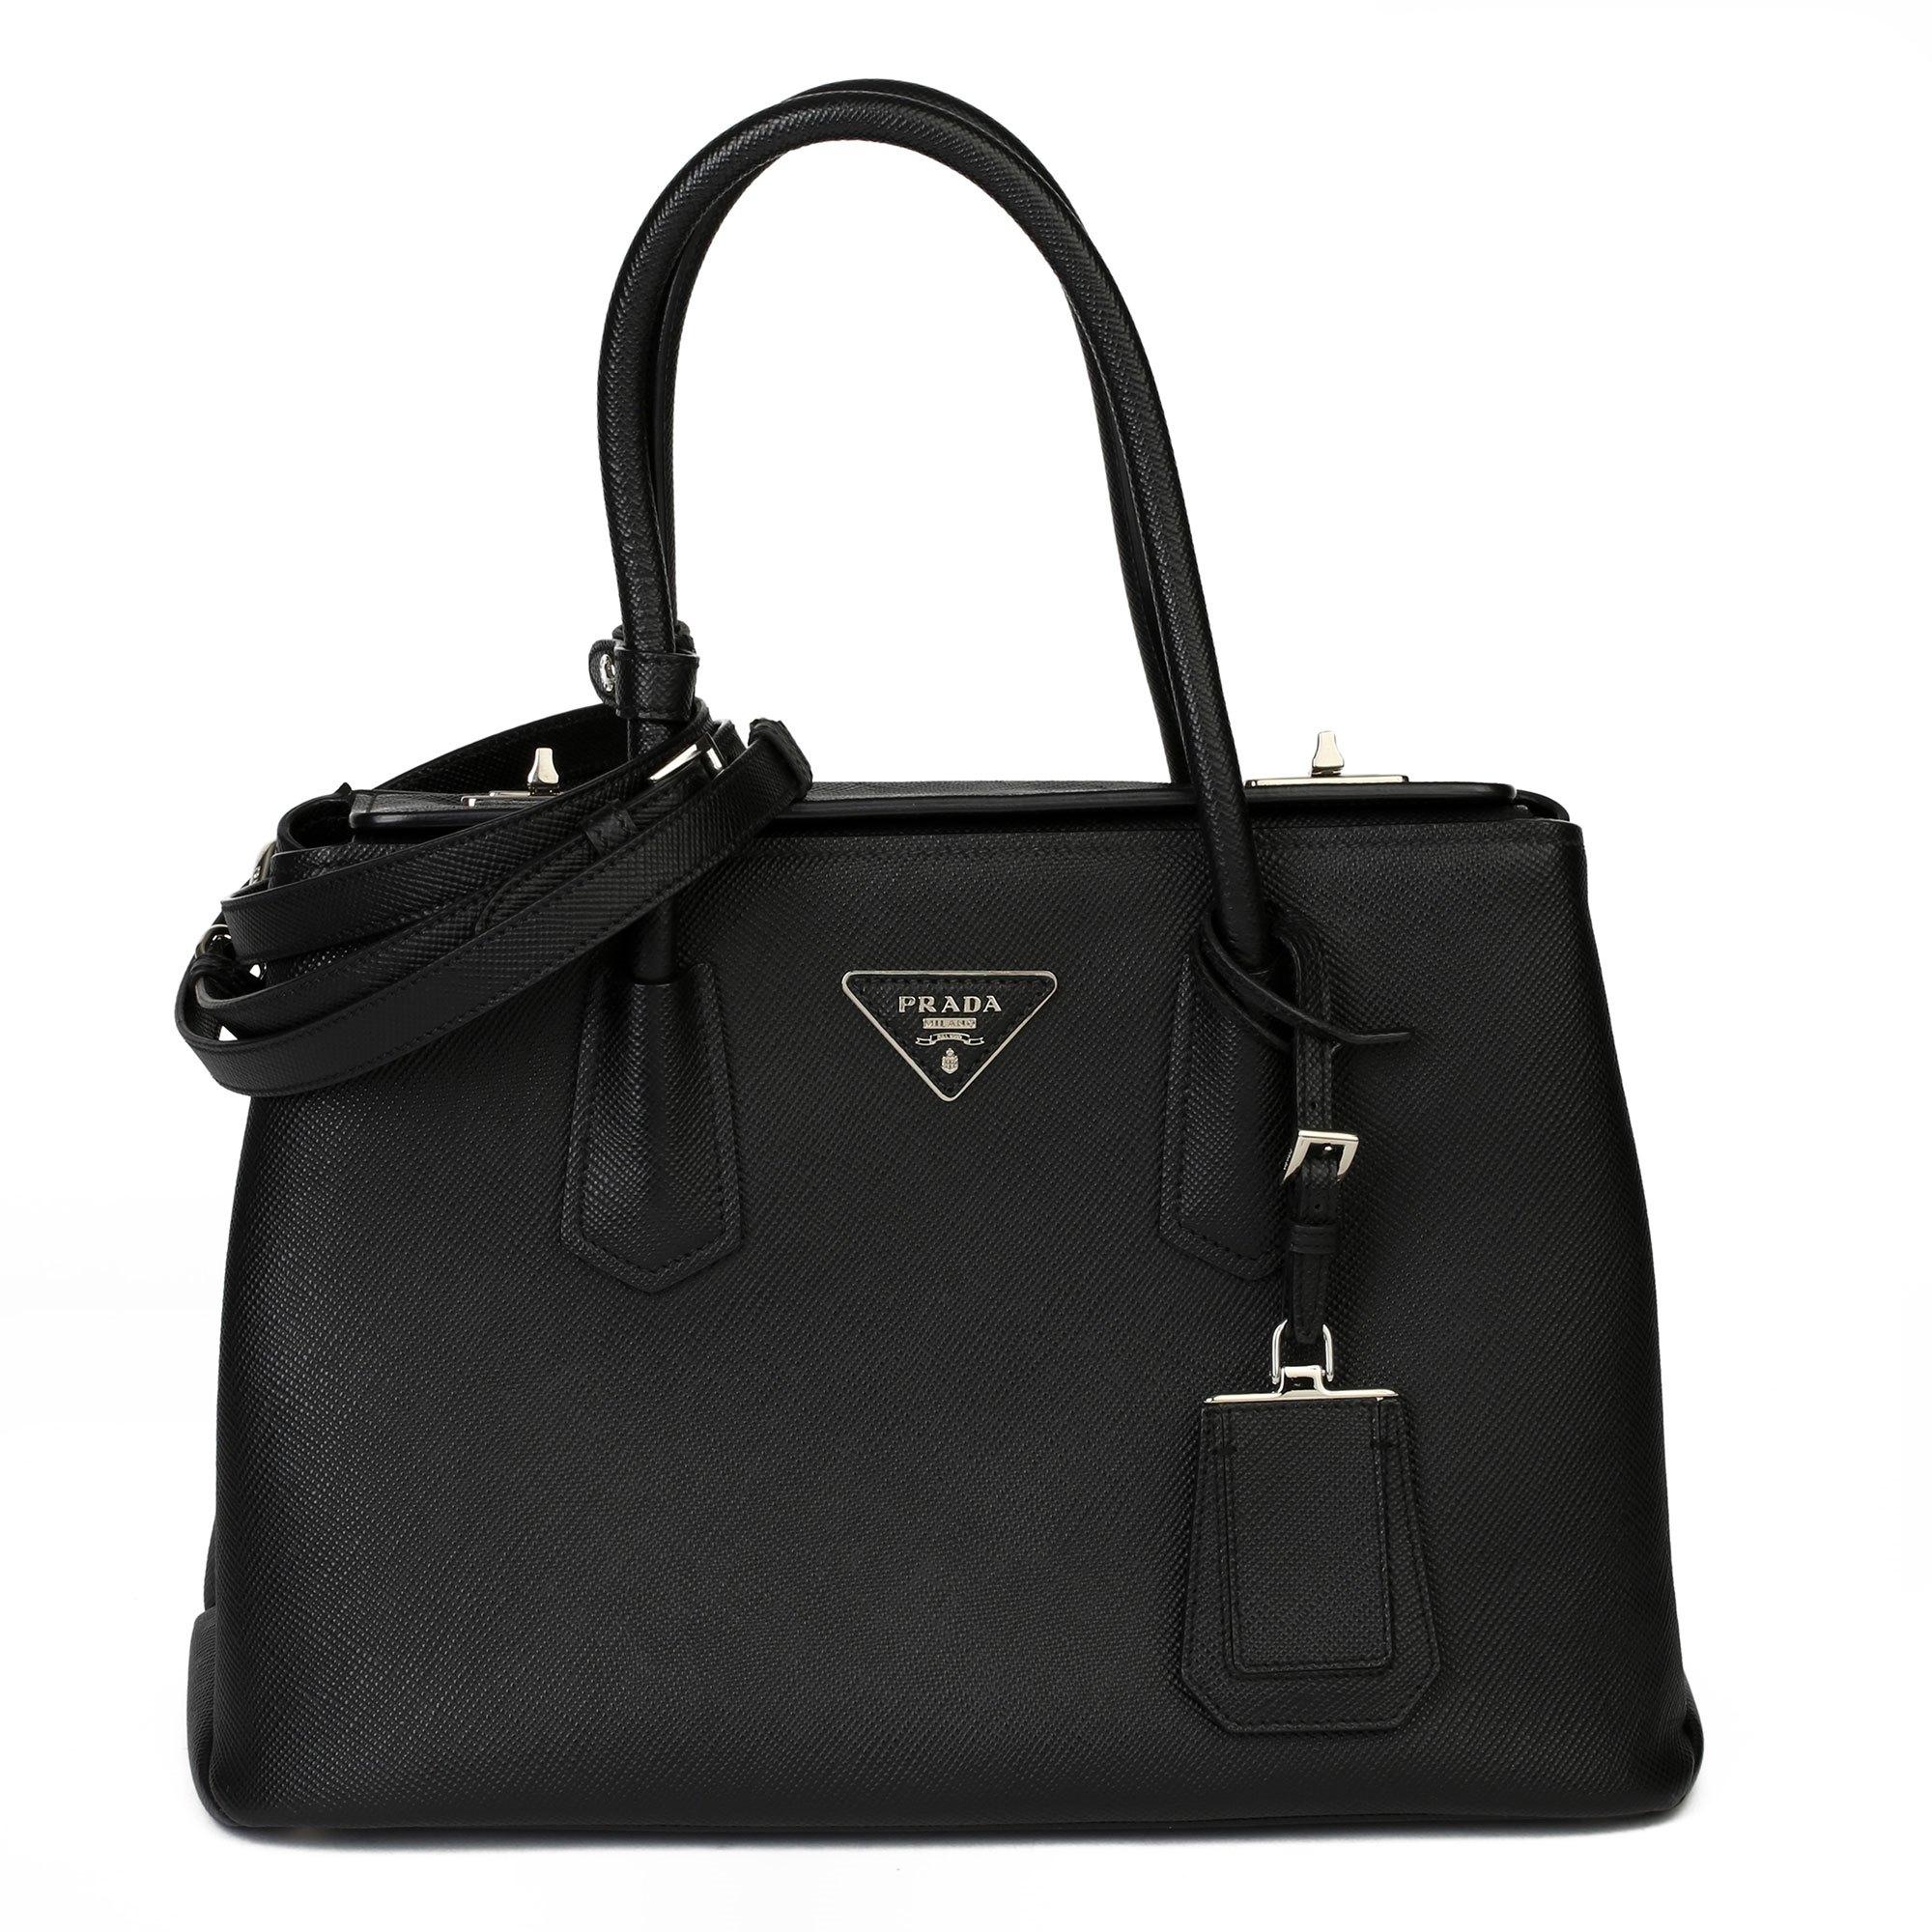 Prada Black Calfskin Leather Saffiano Tote